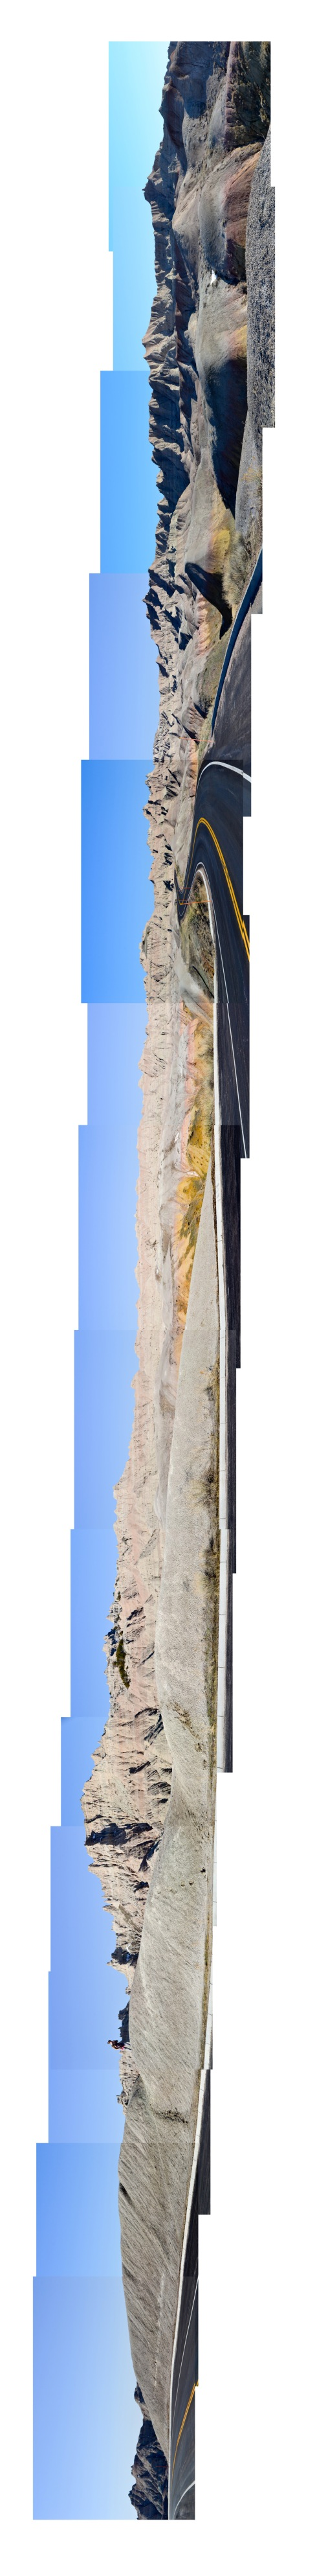 Badland montage 30-300, sideways